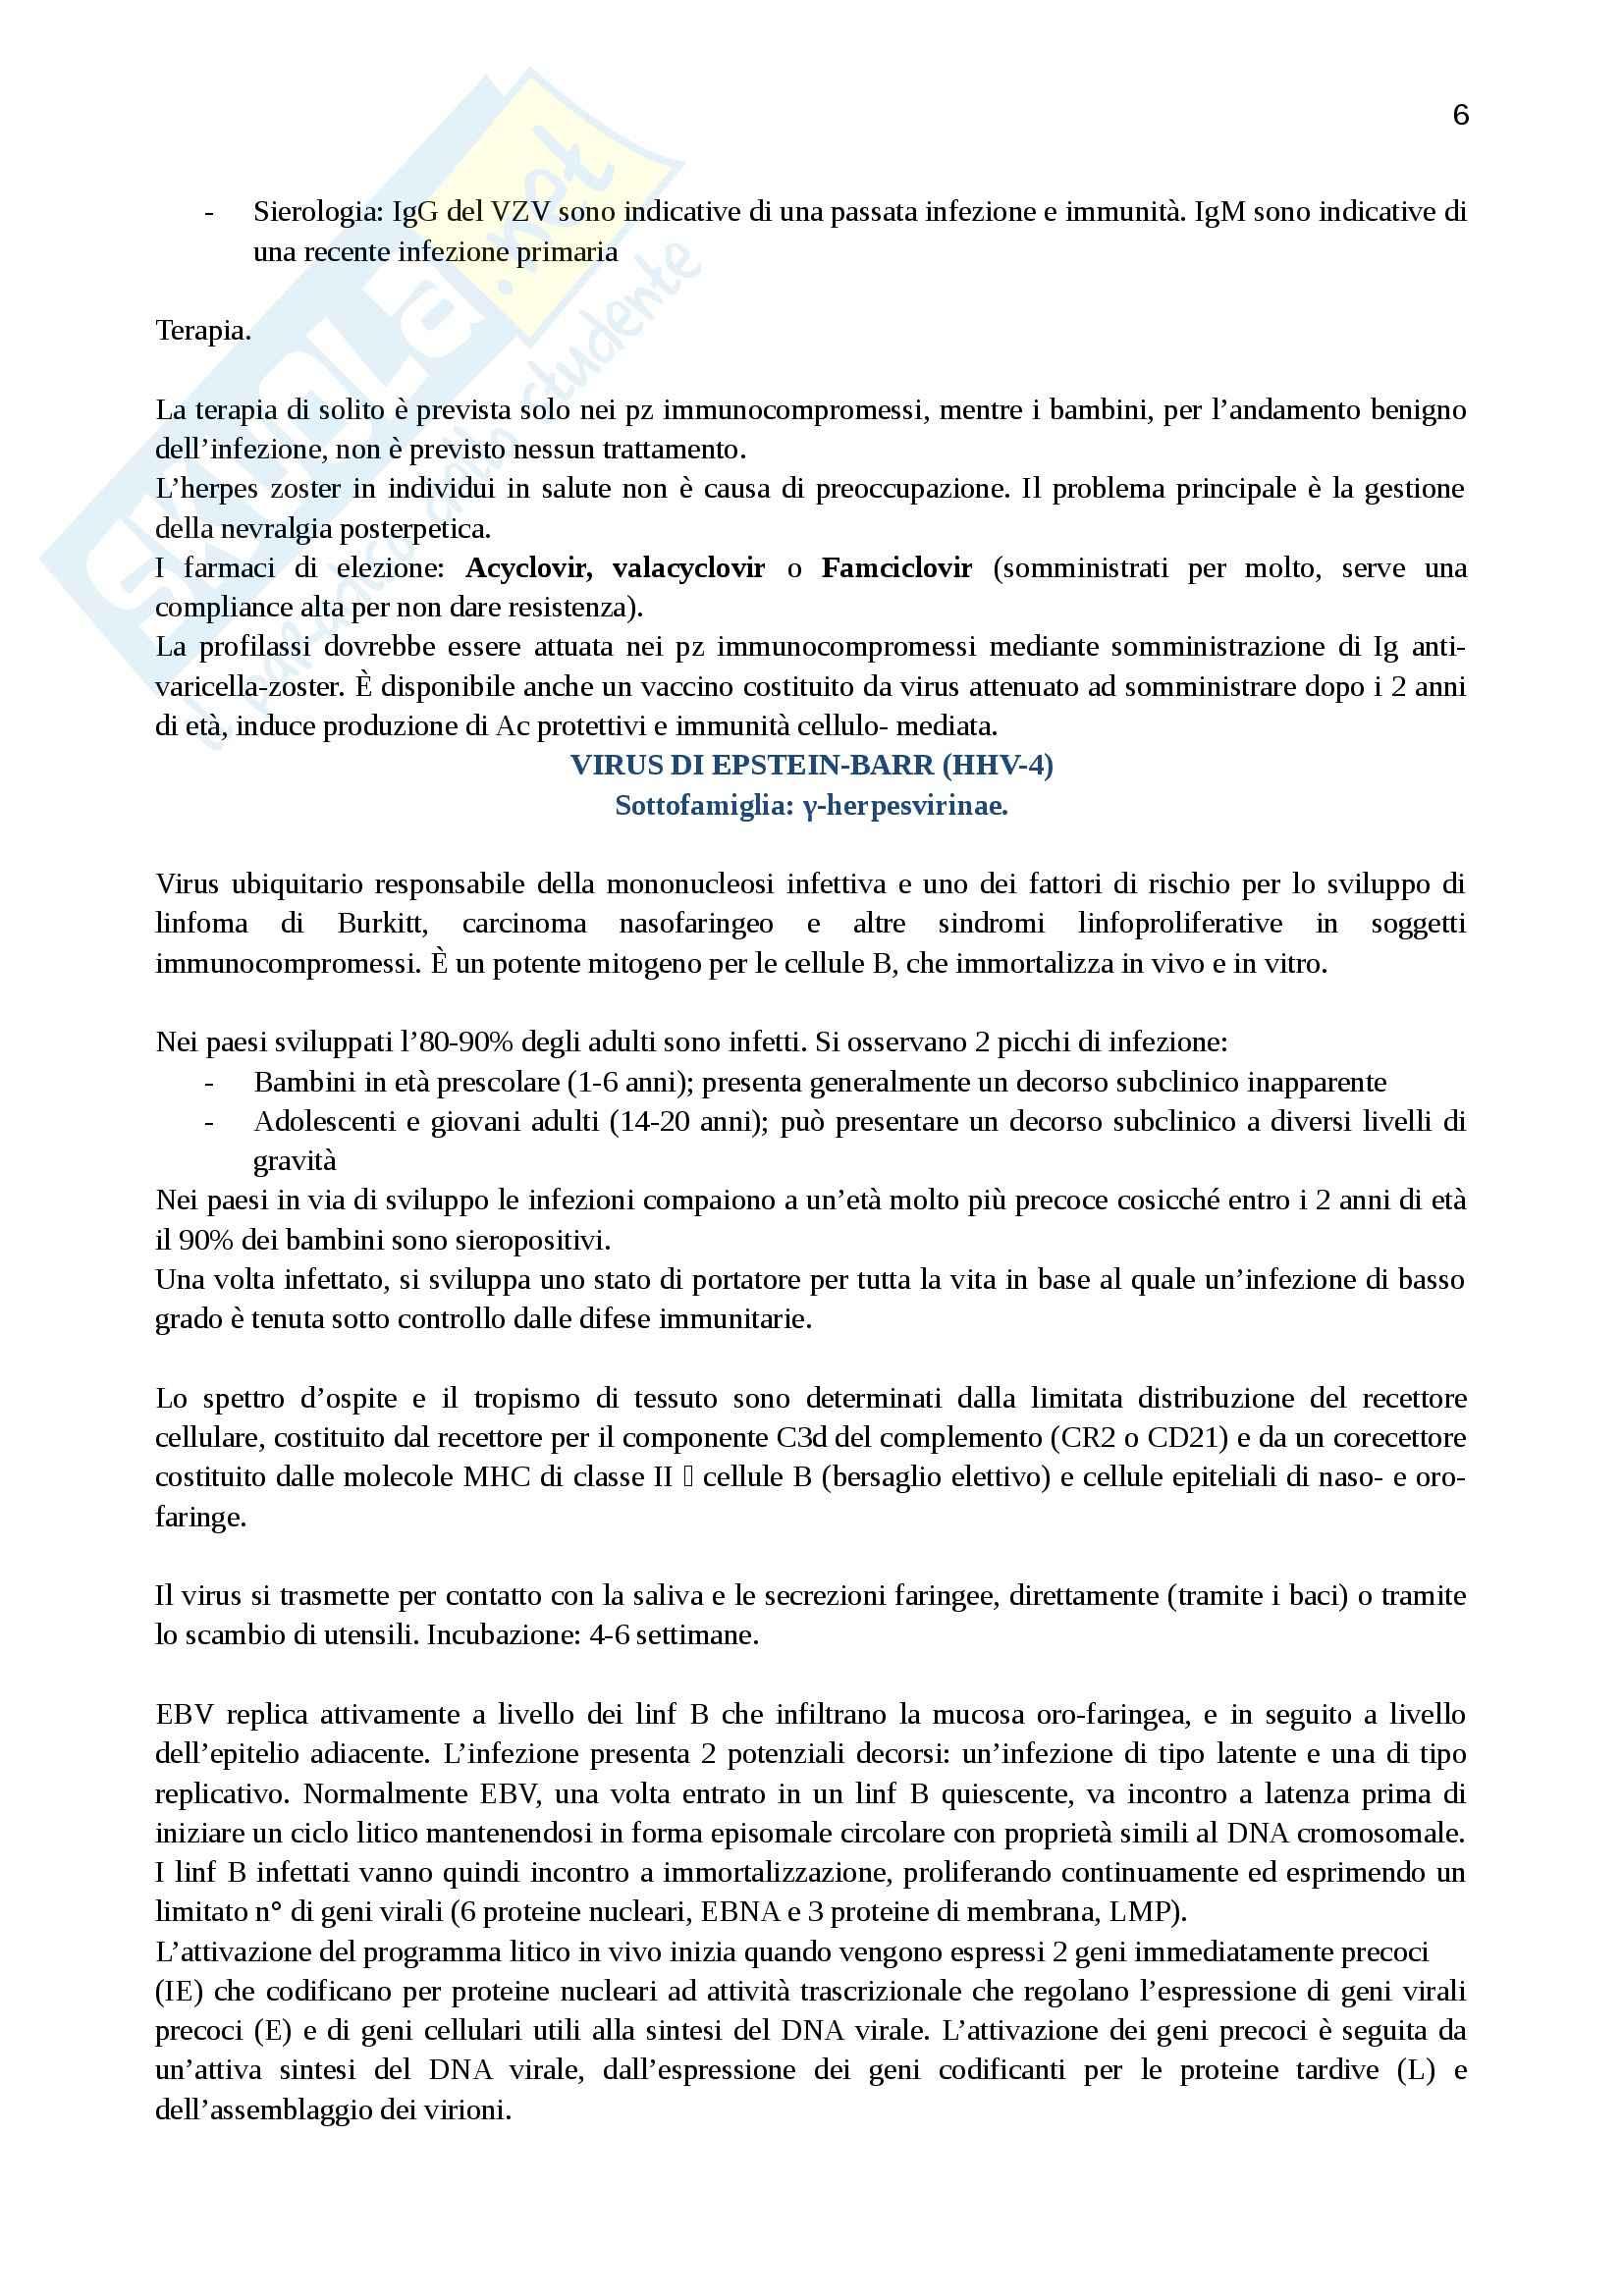 Lezioni, Virologia Pag. 6